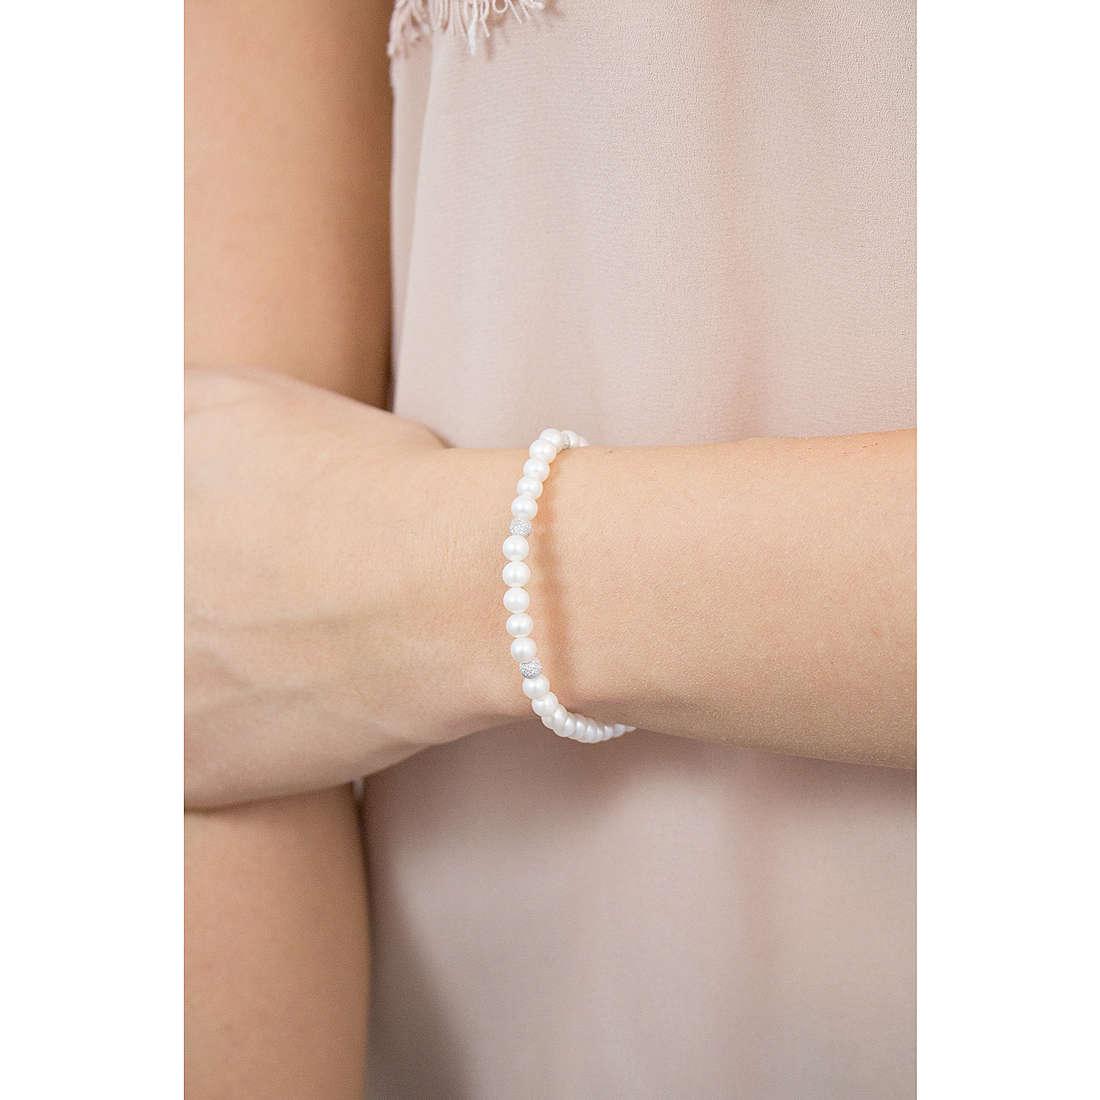 Comete bracelets Fili Fantasia woman BRQ 193 B photo wearing